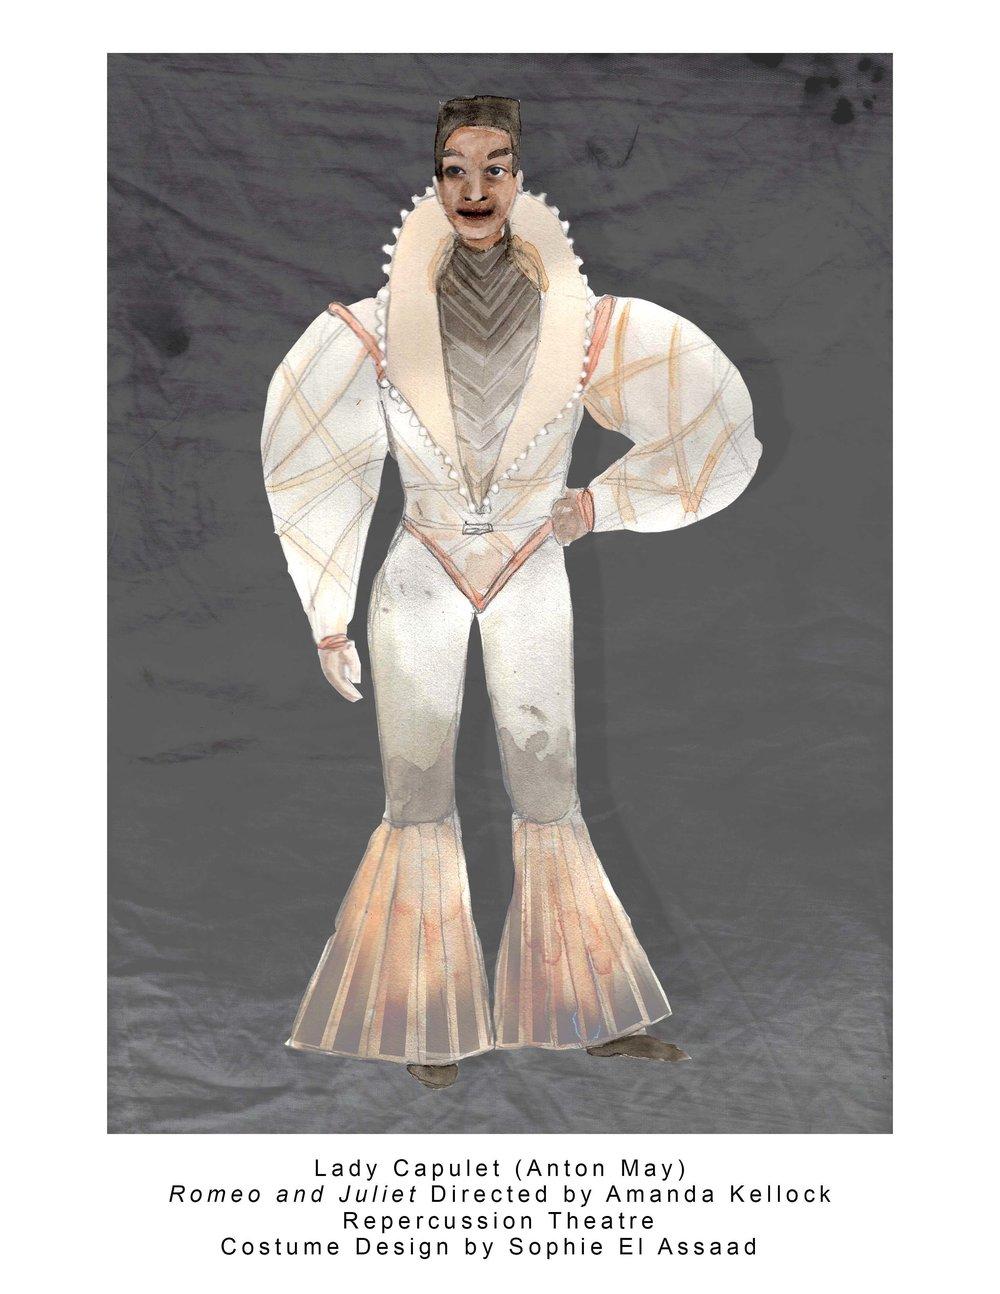 lady capulet1.jpg